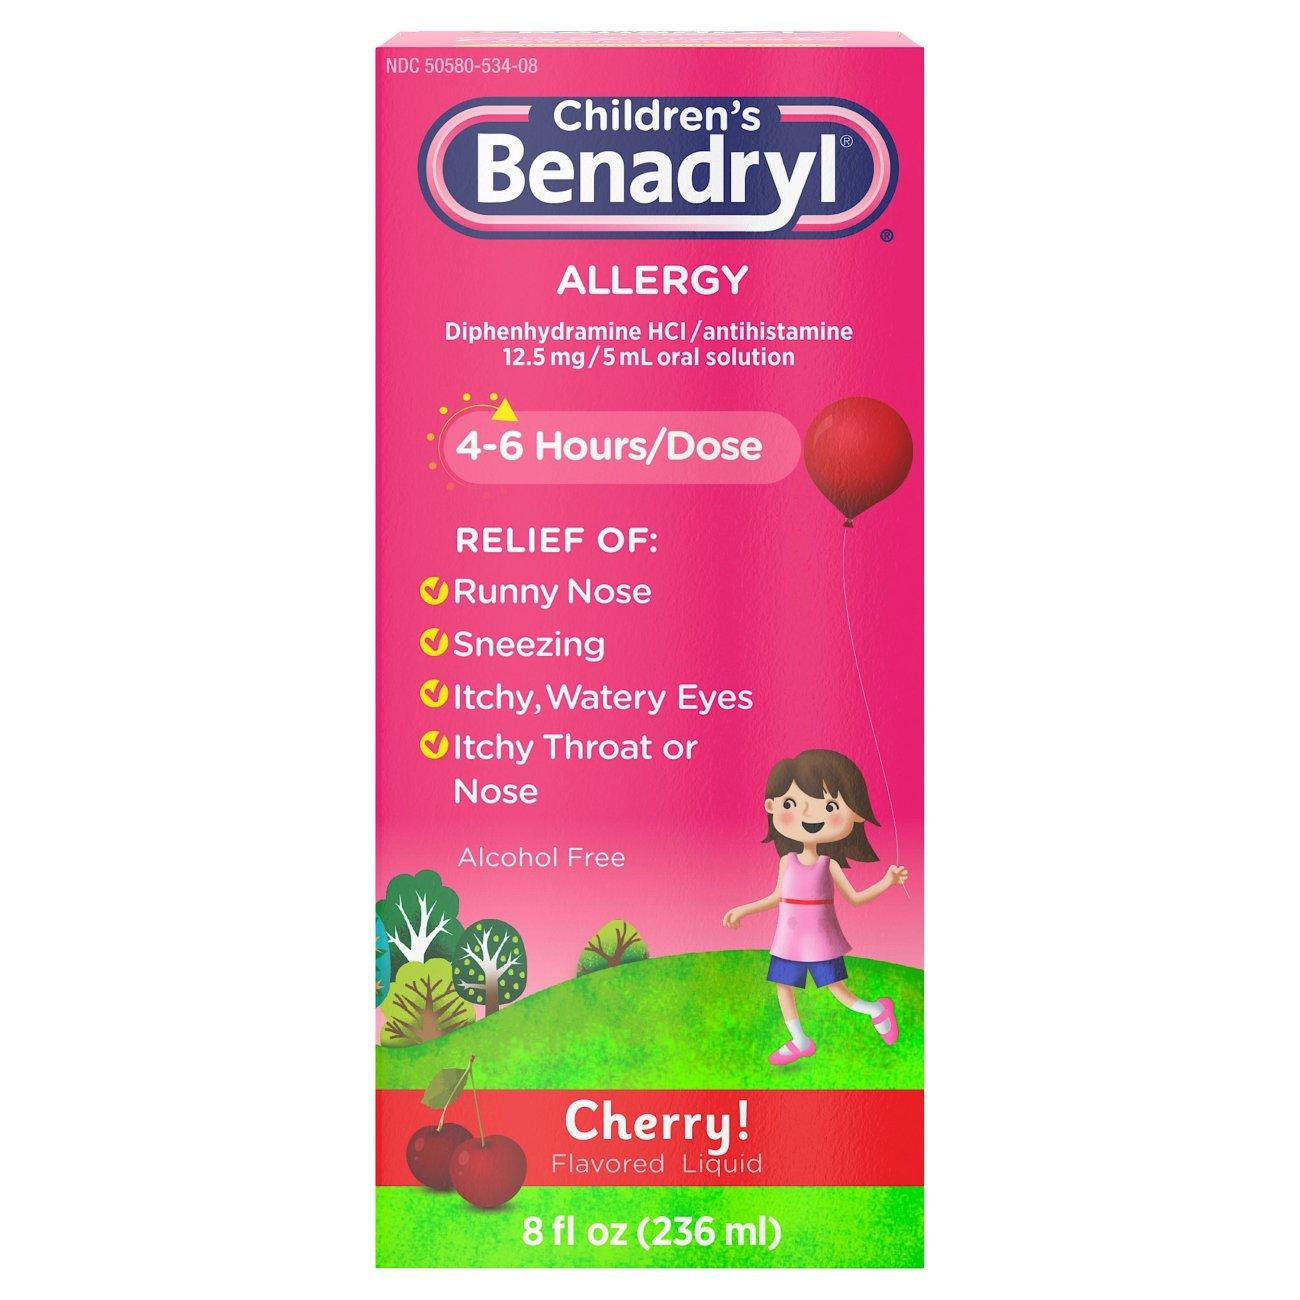 Benadryl childrens allergy cherry flavored liquid shop kids benadryl childrens allergy cherry flavored liquid shop kids allergy at heb geenschuldenfo Choice Image